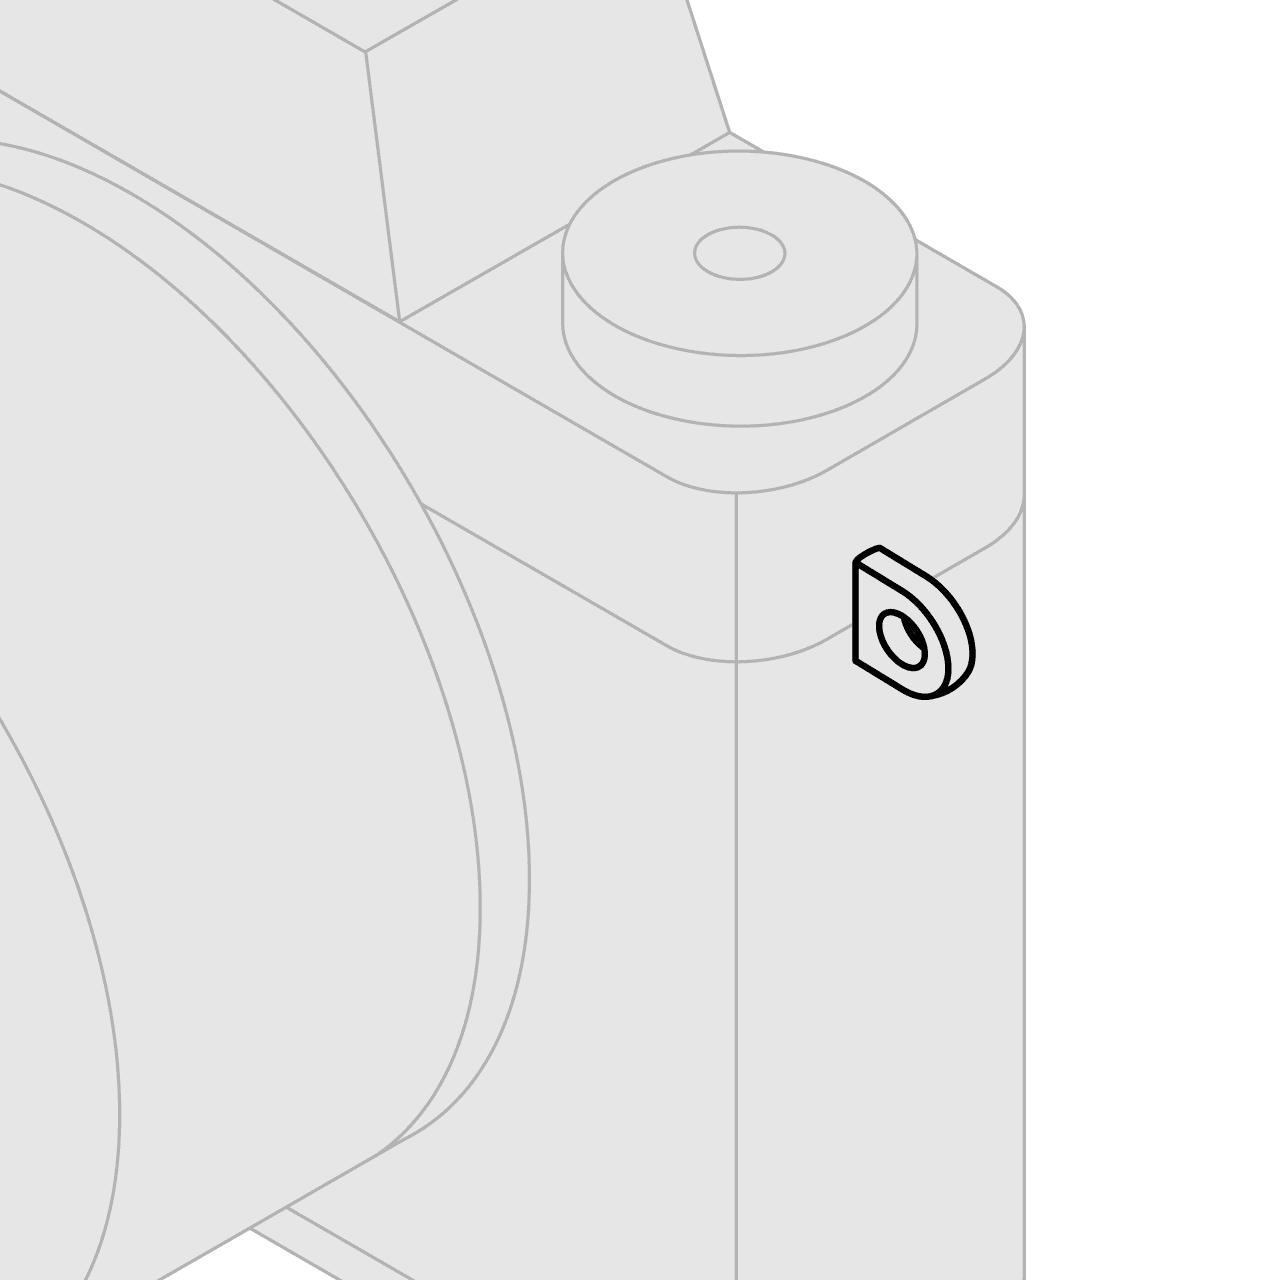 اتصال تسمه دوربین Lug Mount